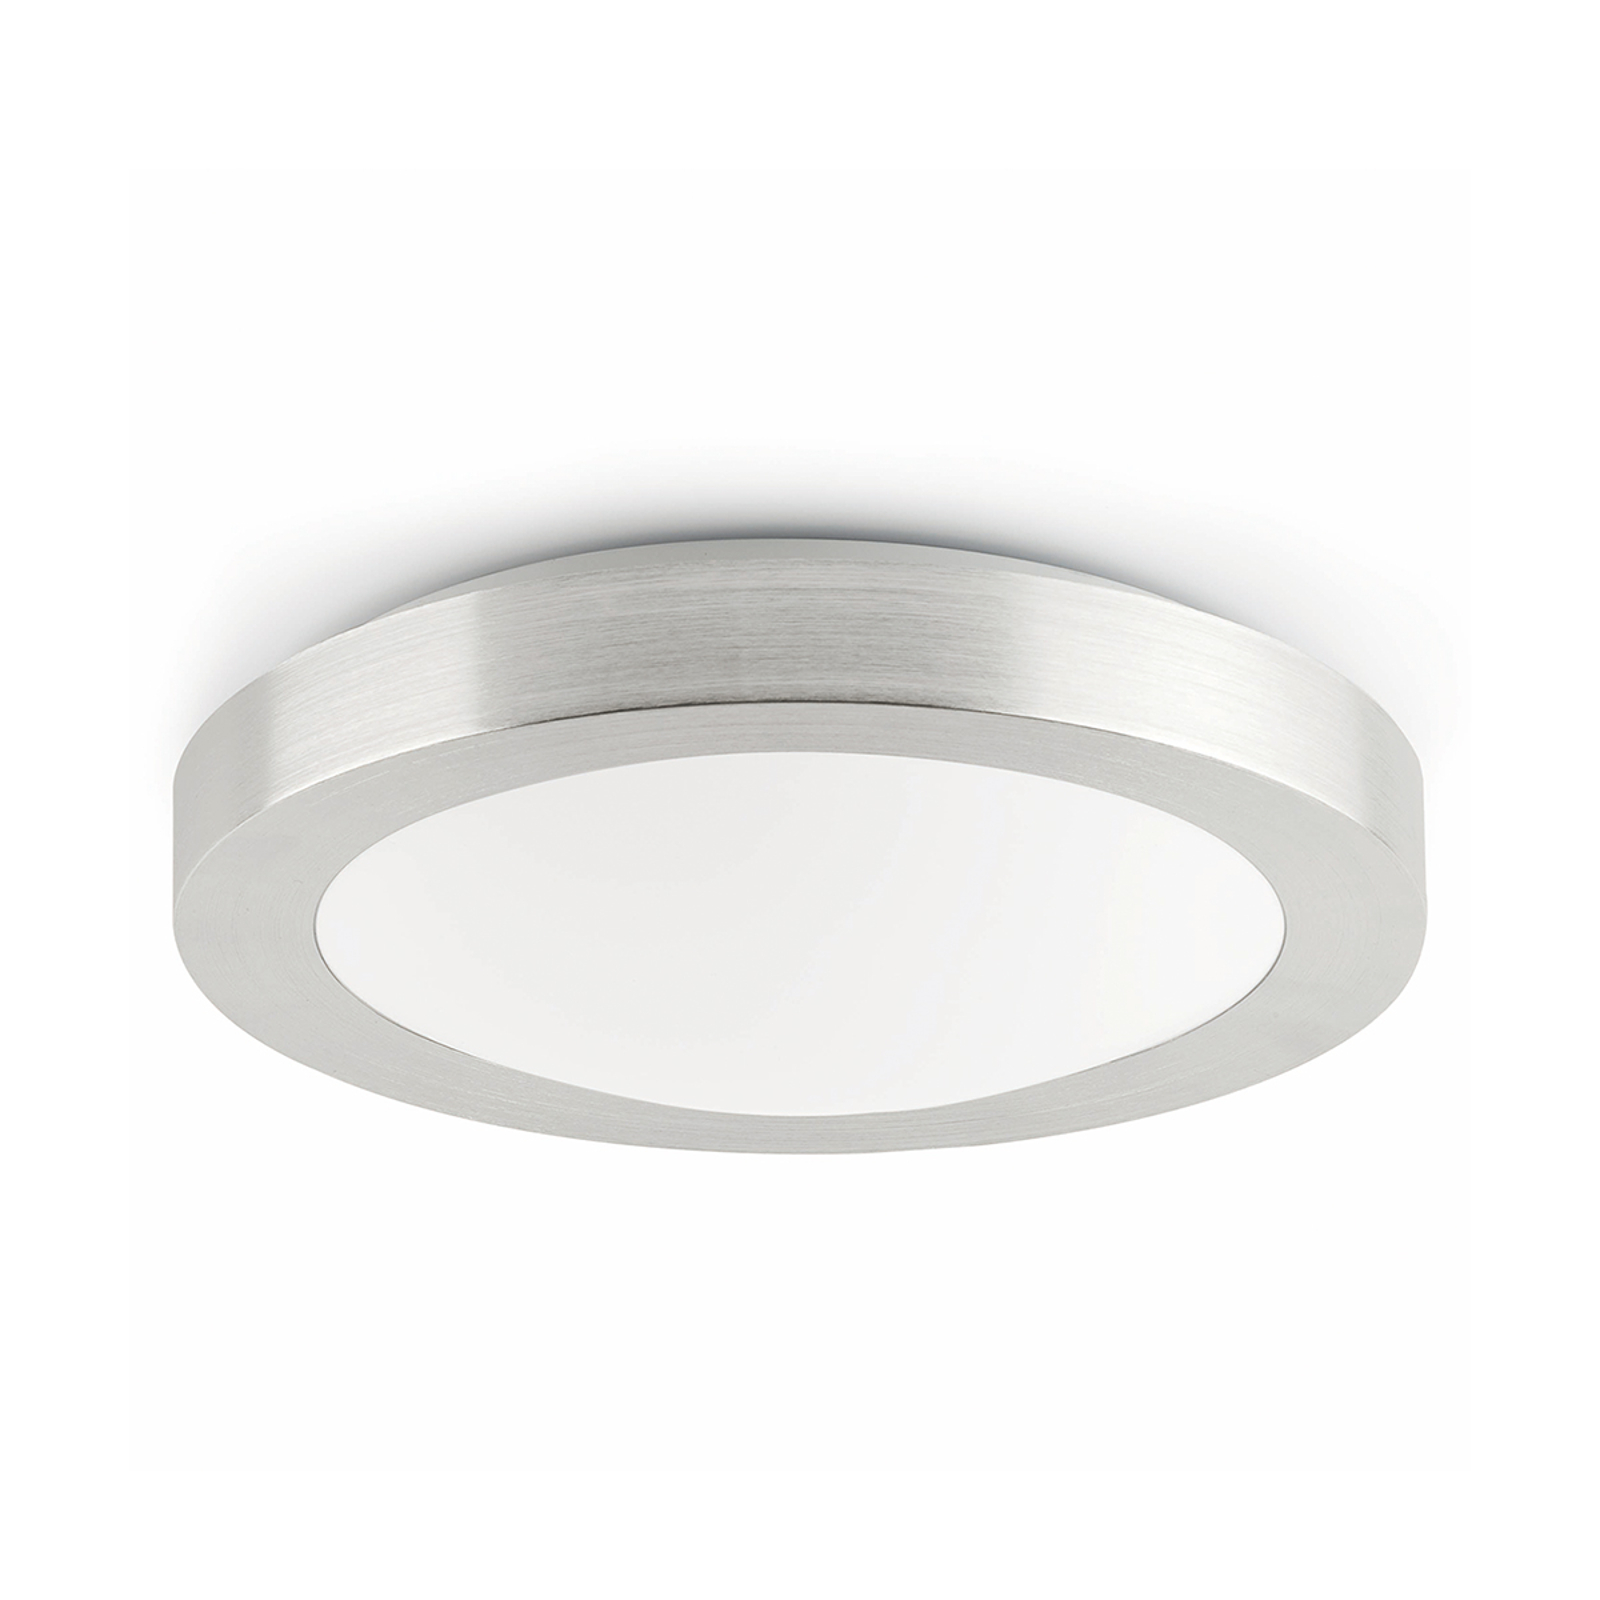 Functionele plafondlamp LOGOS, 35 cm